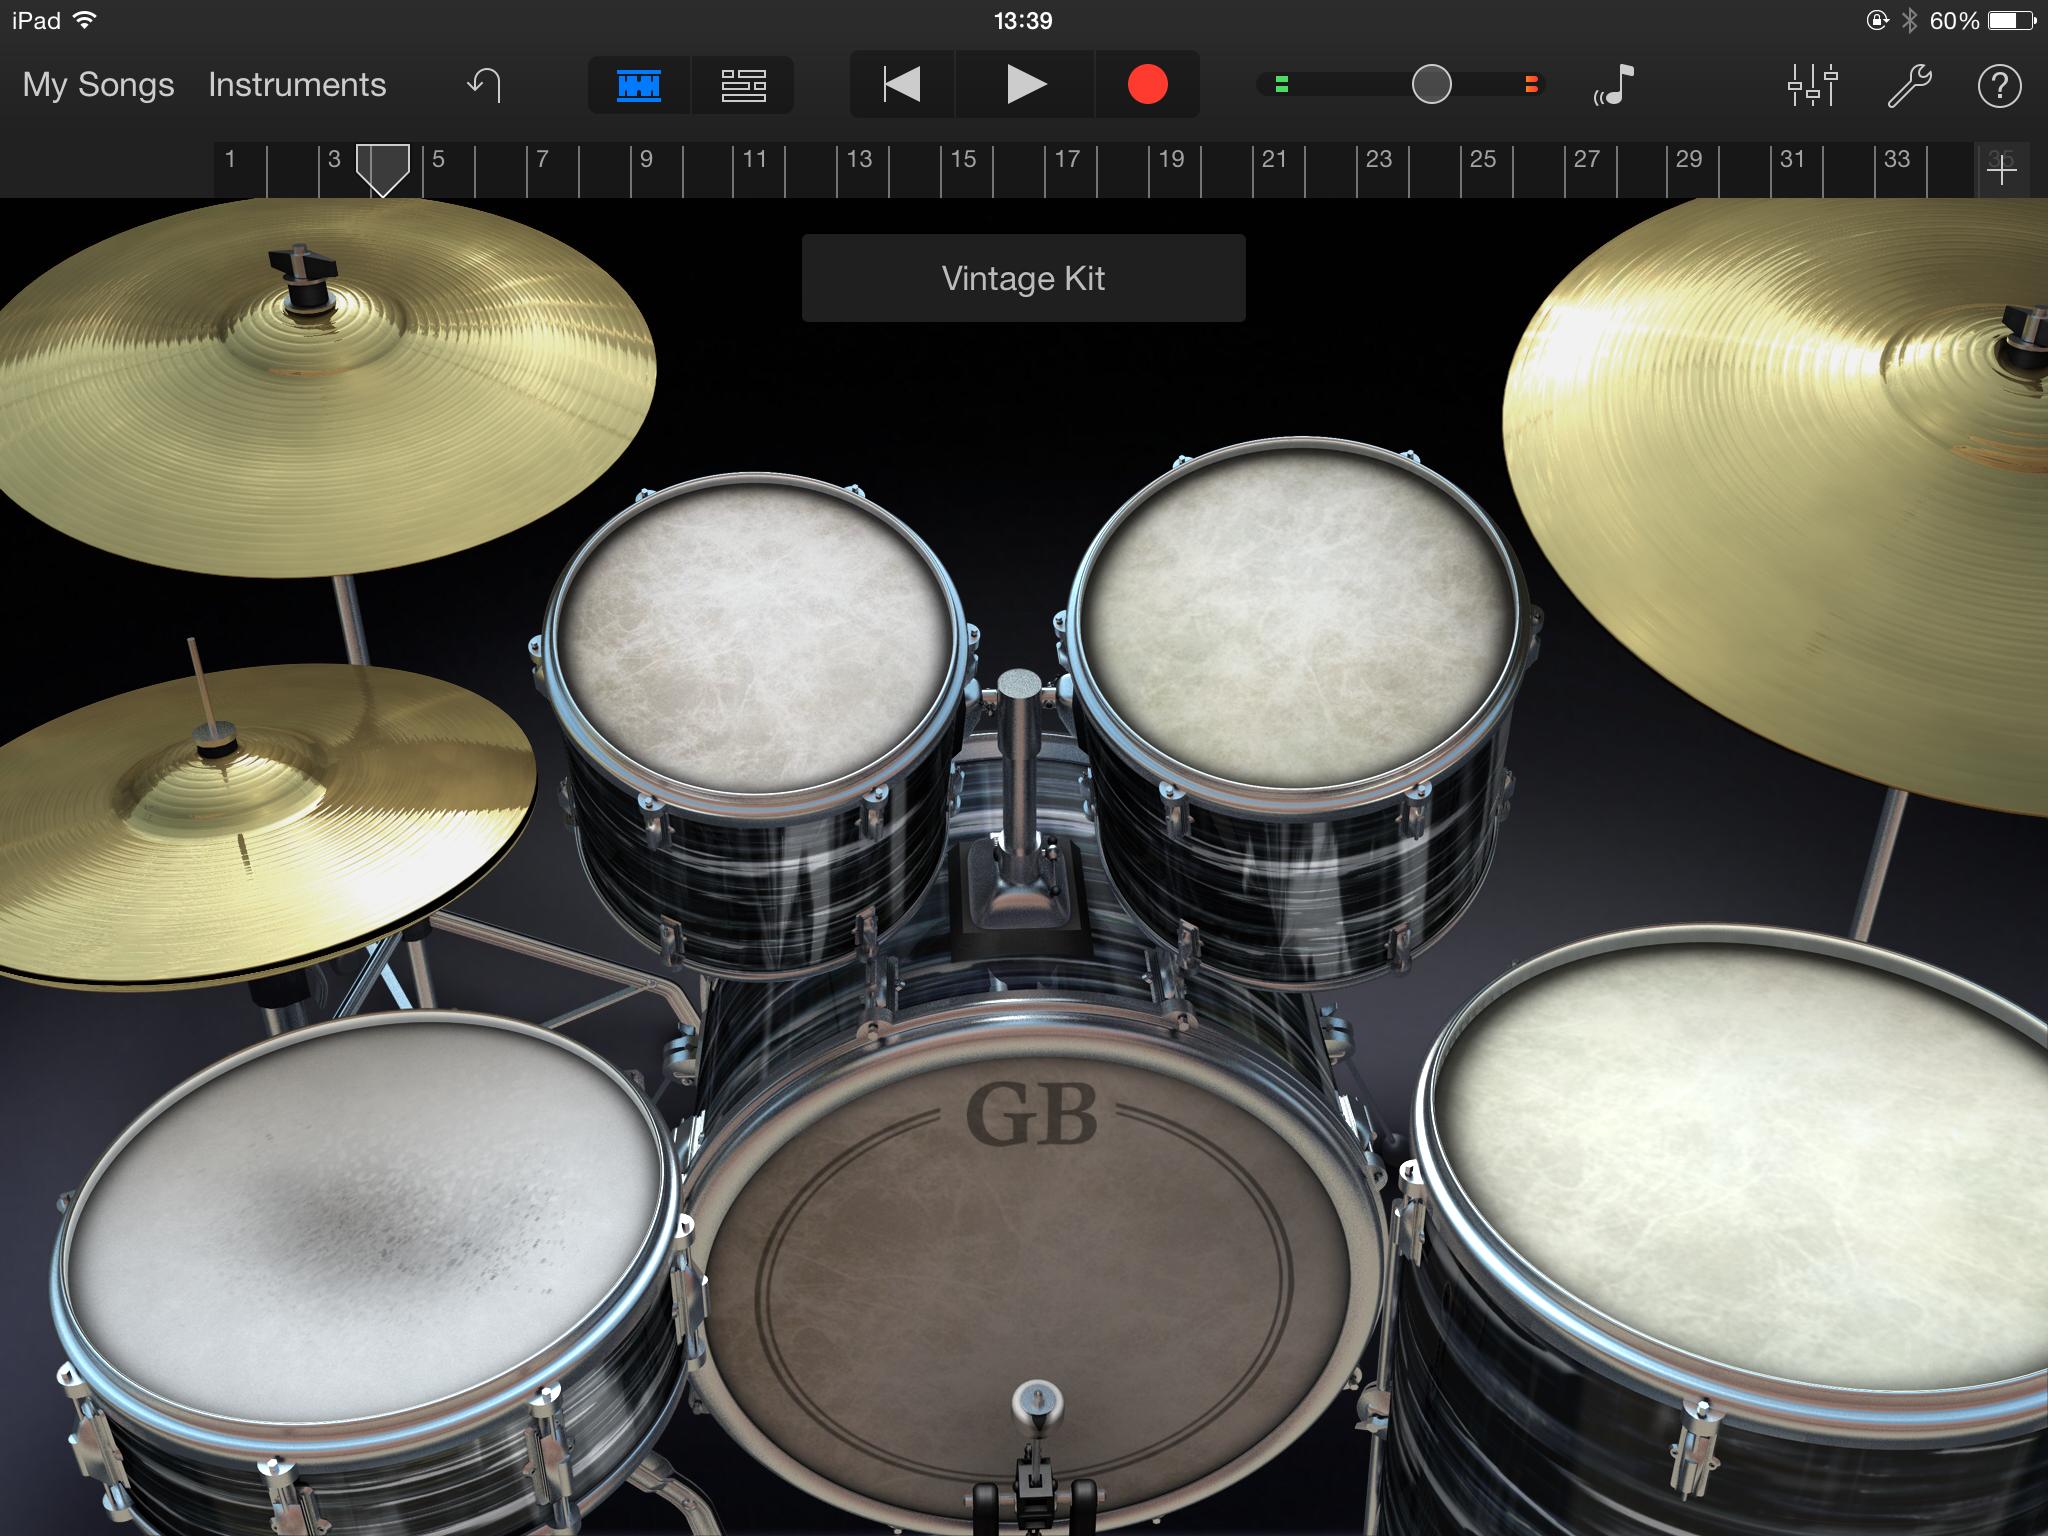 Garageband tutorial how to use garageband on ipad iphone 3 garageband drums baditri Images